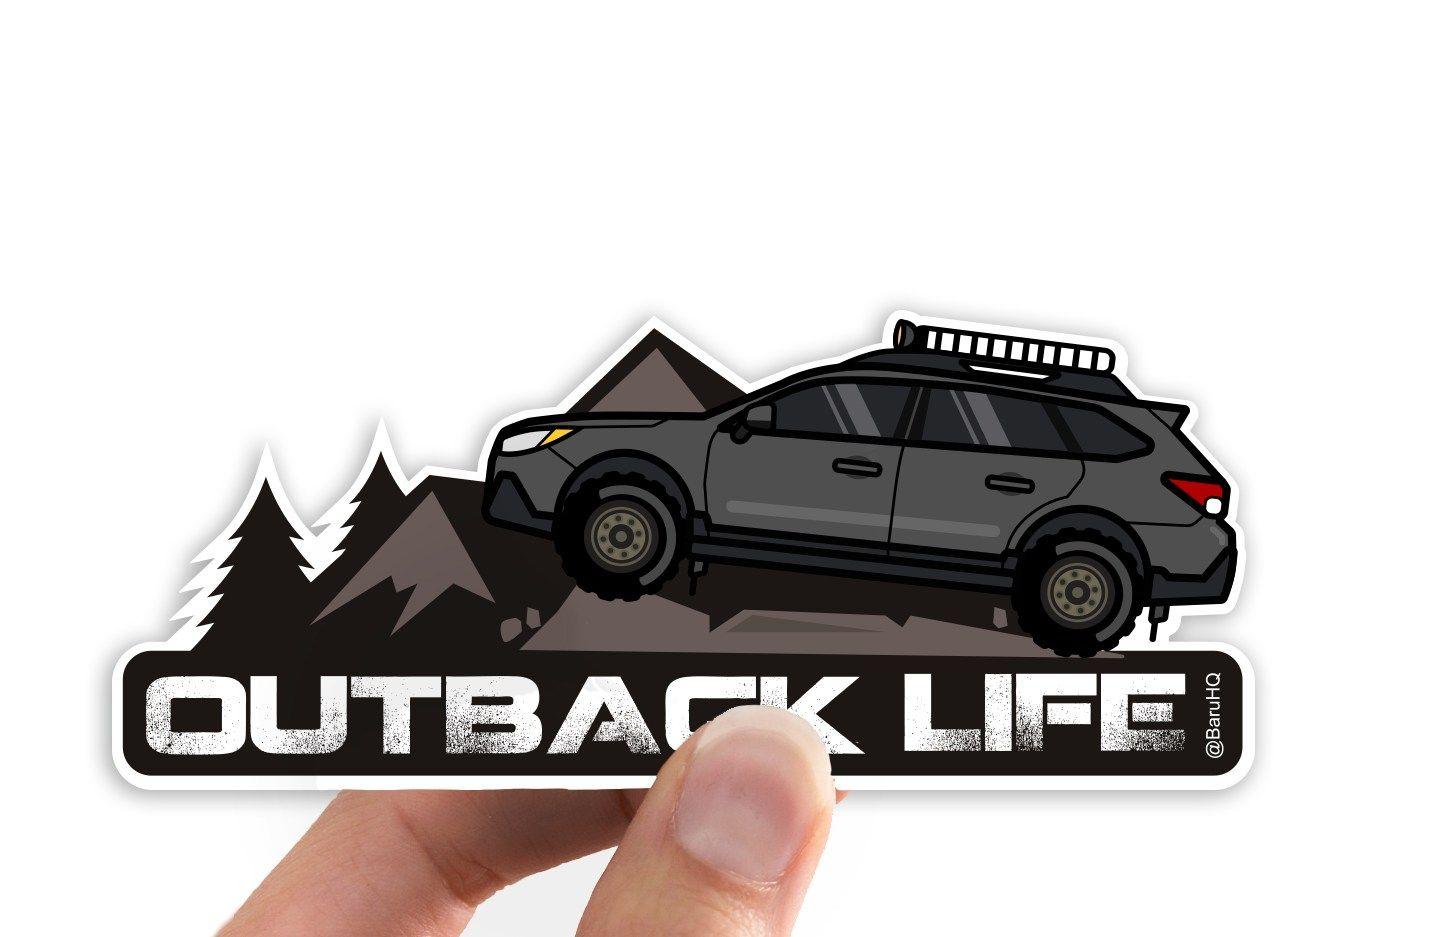 Outback Life Subaru Outback Car Decal Baru Hq Outback Car Subaru Outback Subaru [ 937 x 1431 Pixel ]